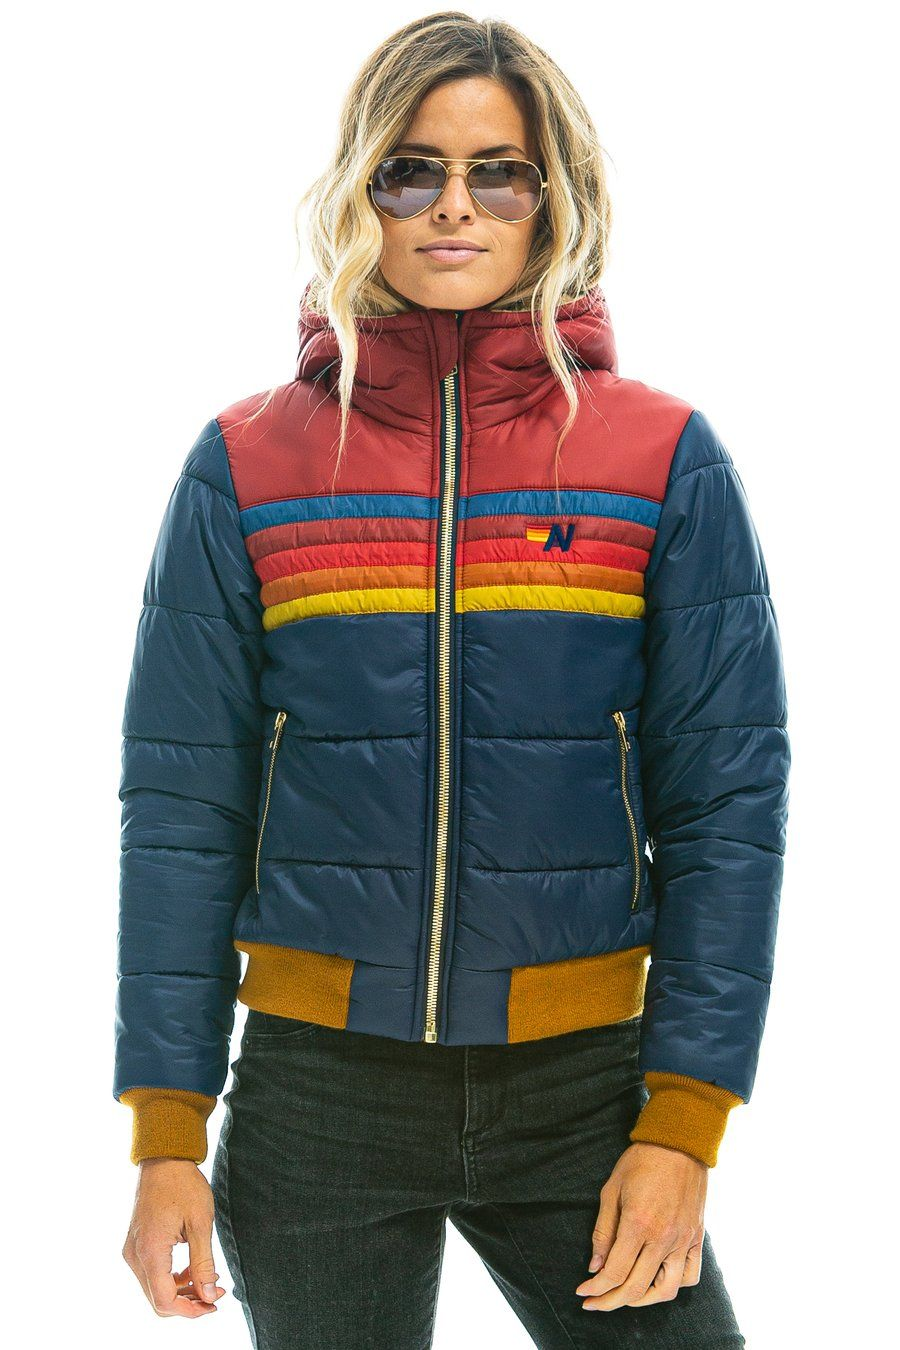 Women S Trekker 2 Hooded Puffer Jacket Garden Green In 2020 Puffer Jackets Jackets Jackets For Women [ 1350 x 900 Pixel ]